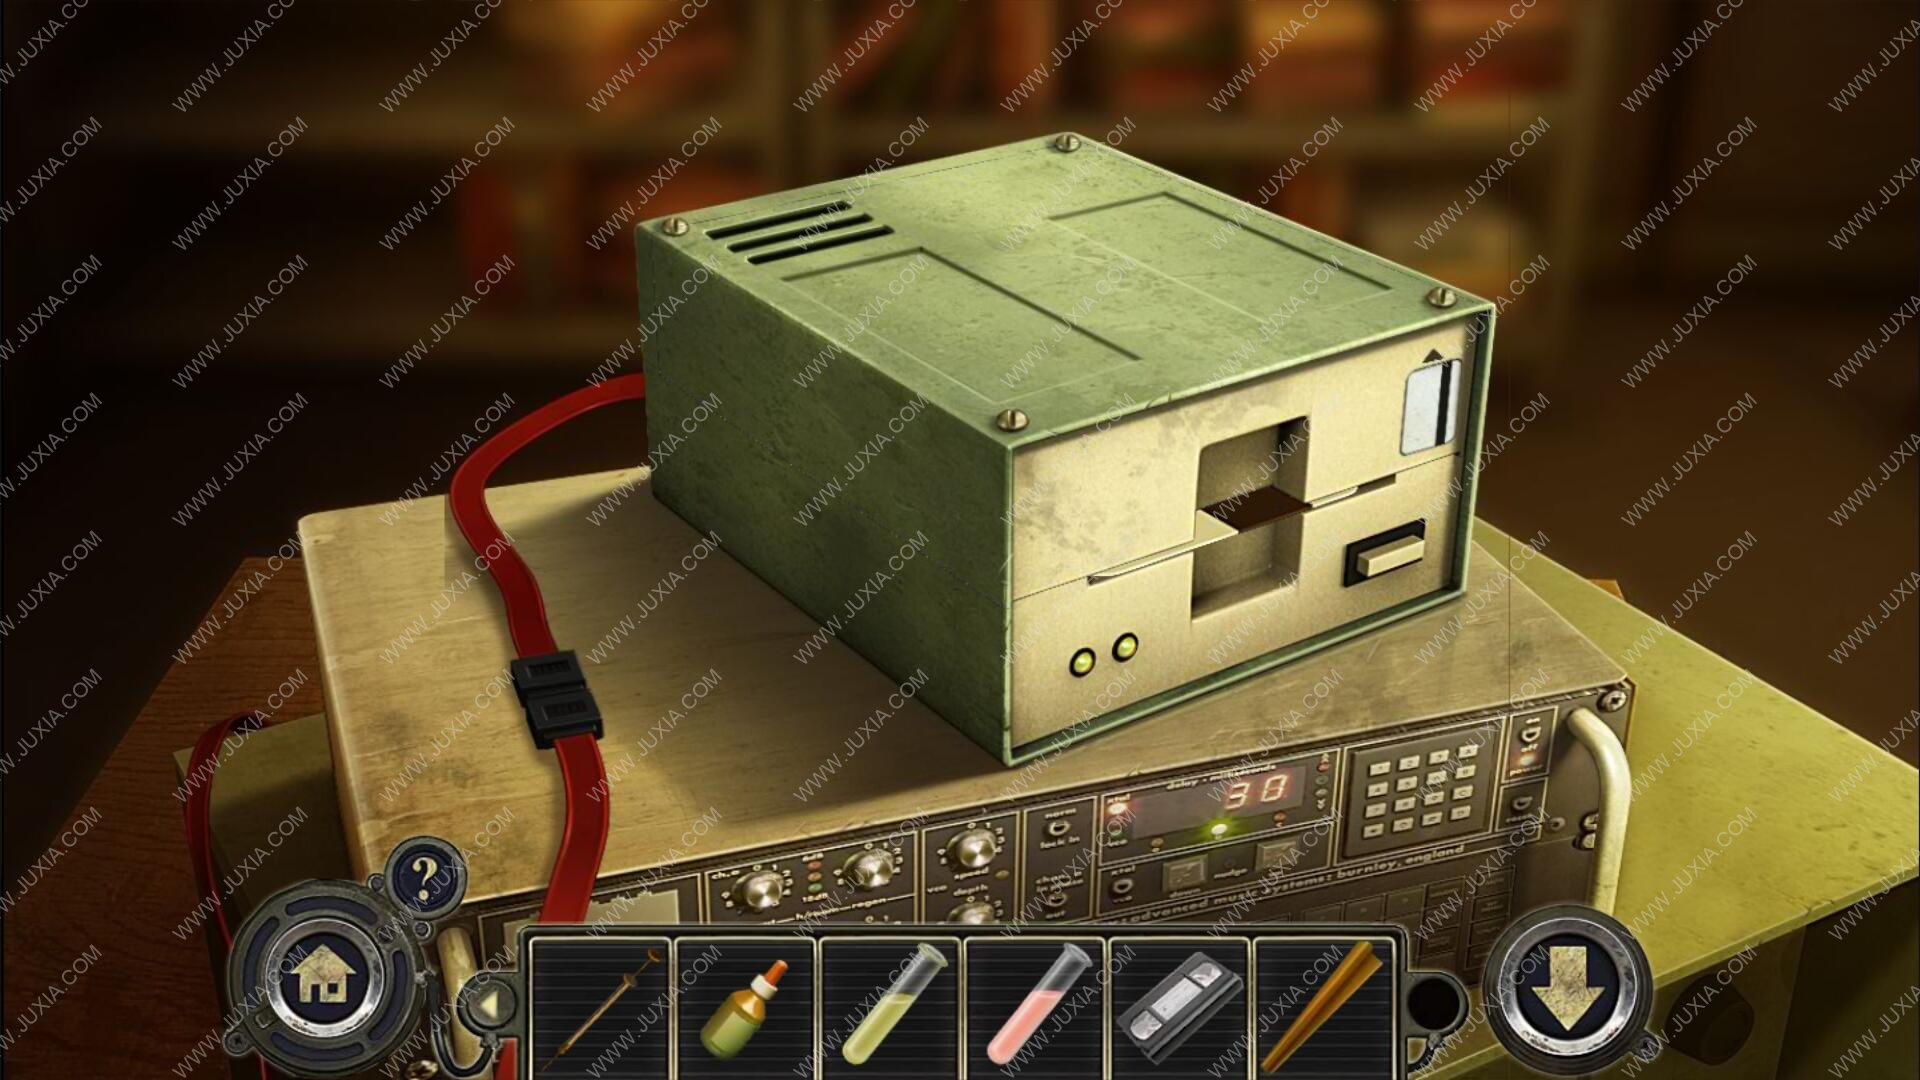 Facility47攻略第四关图文 47号房间攻略第4关笔画怎么解开